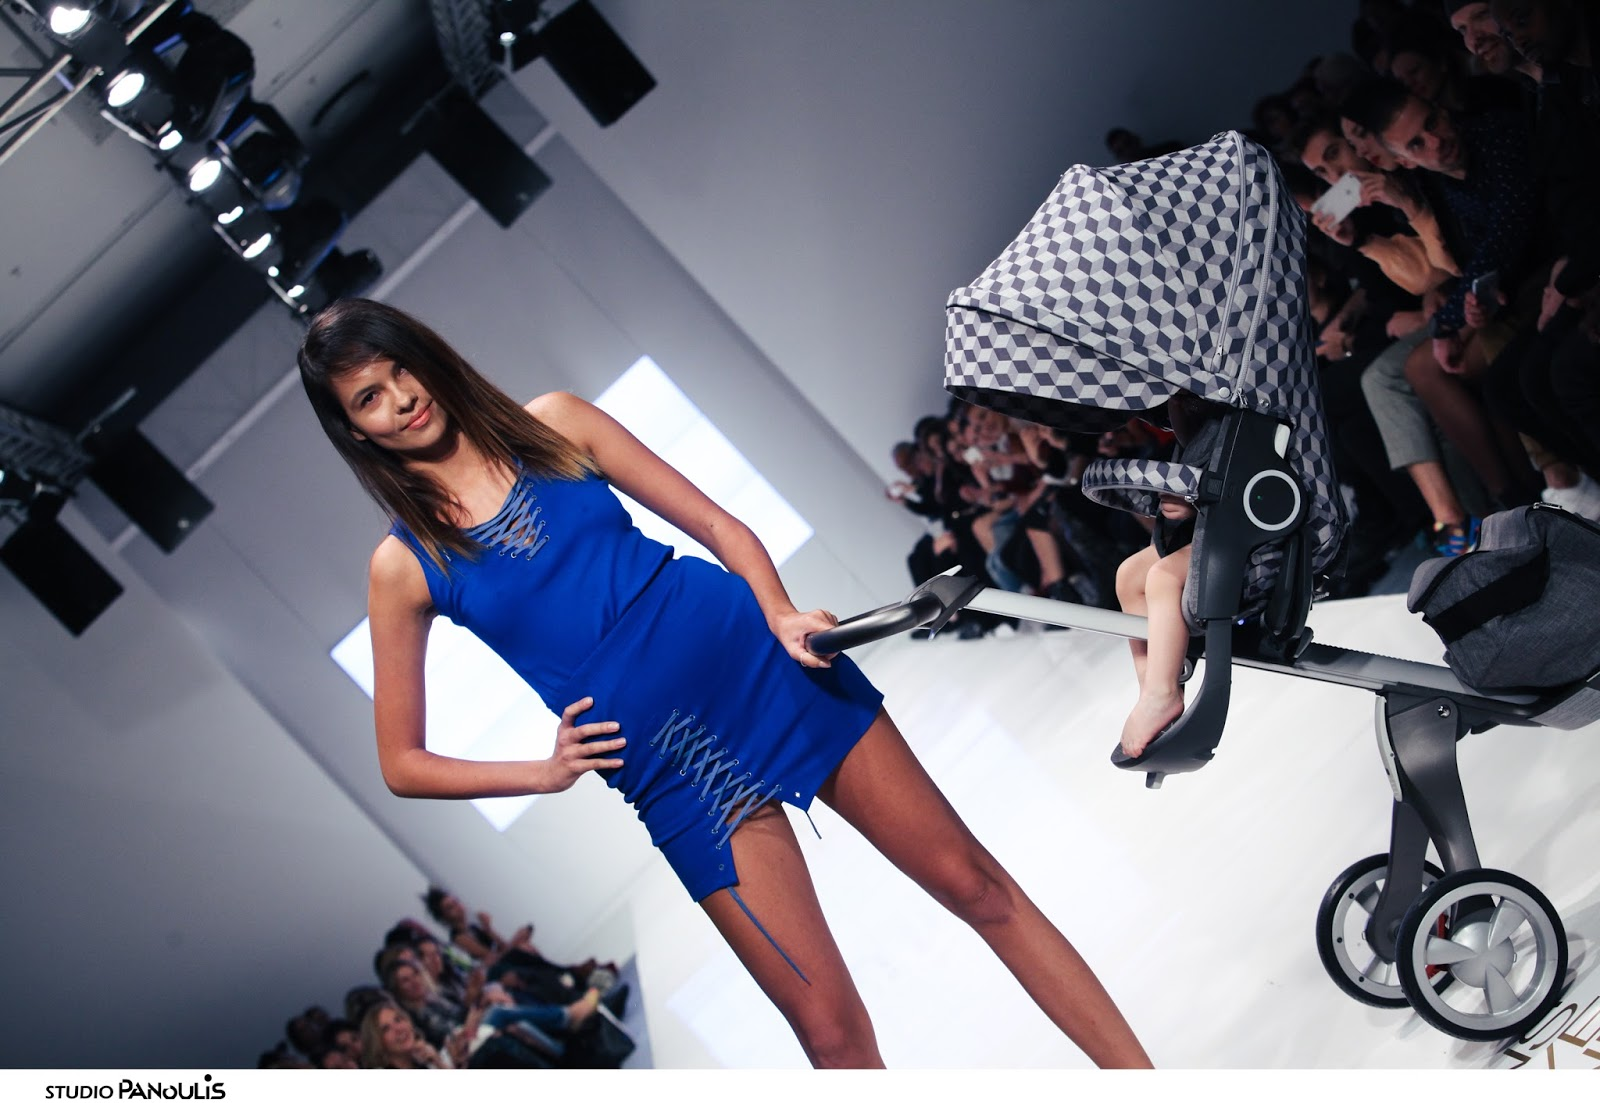 e1c9679309c 41 σχεδιαστές και fashion brands από την Ελλάδα και το εξωτερικό αλλά και  12 πολλά υποσχόμενοι νέοι σχεδιαστές παρουσίασαν τις νέες τάσεις της μόδας  στις ...